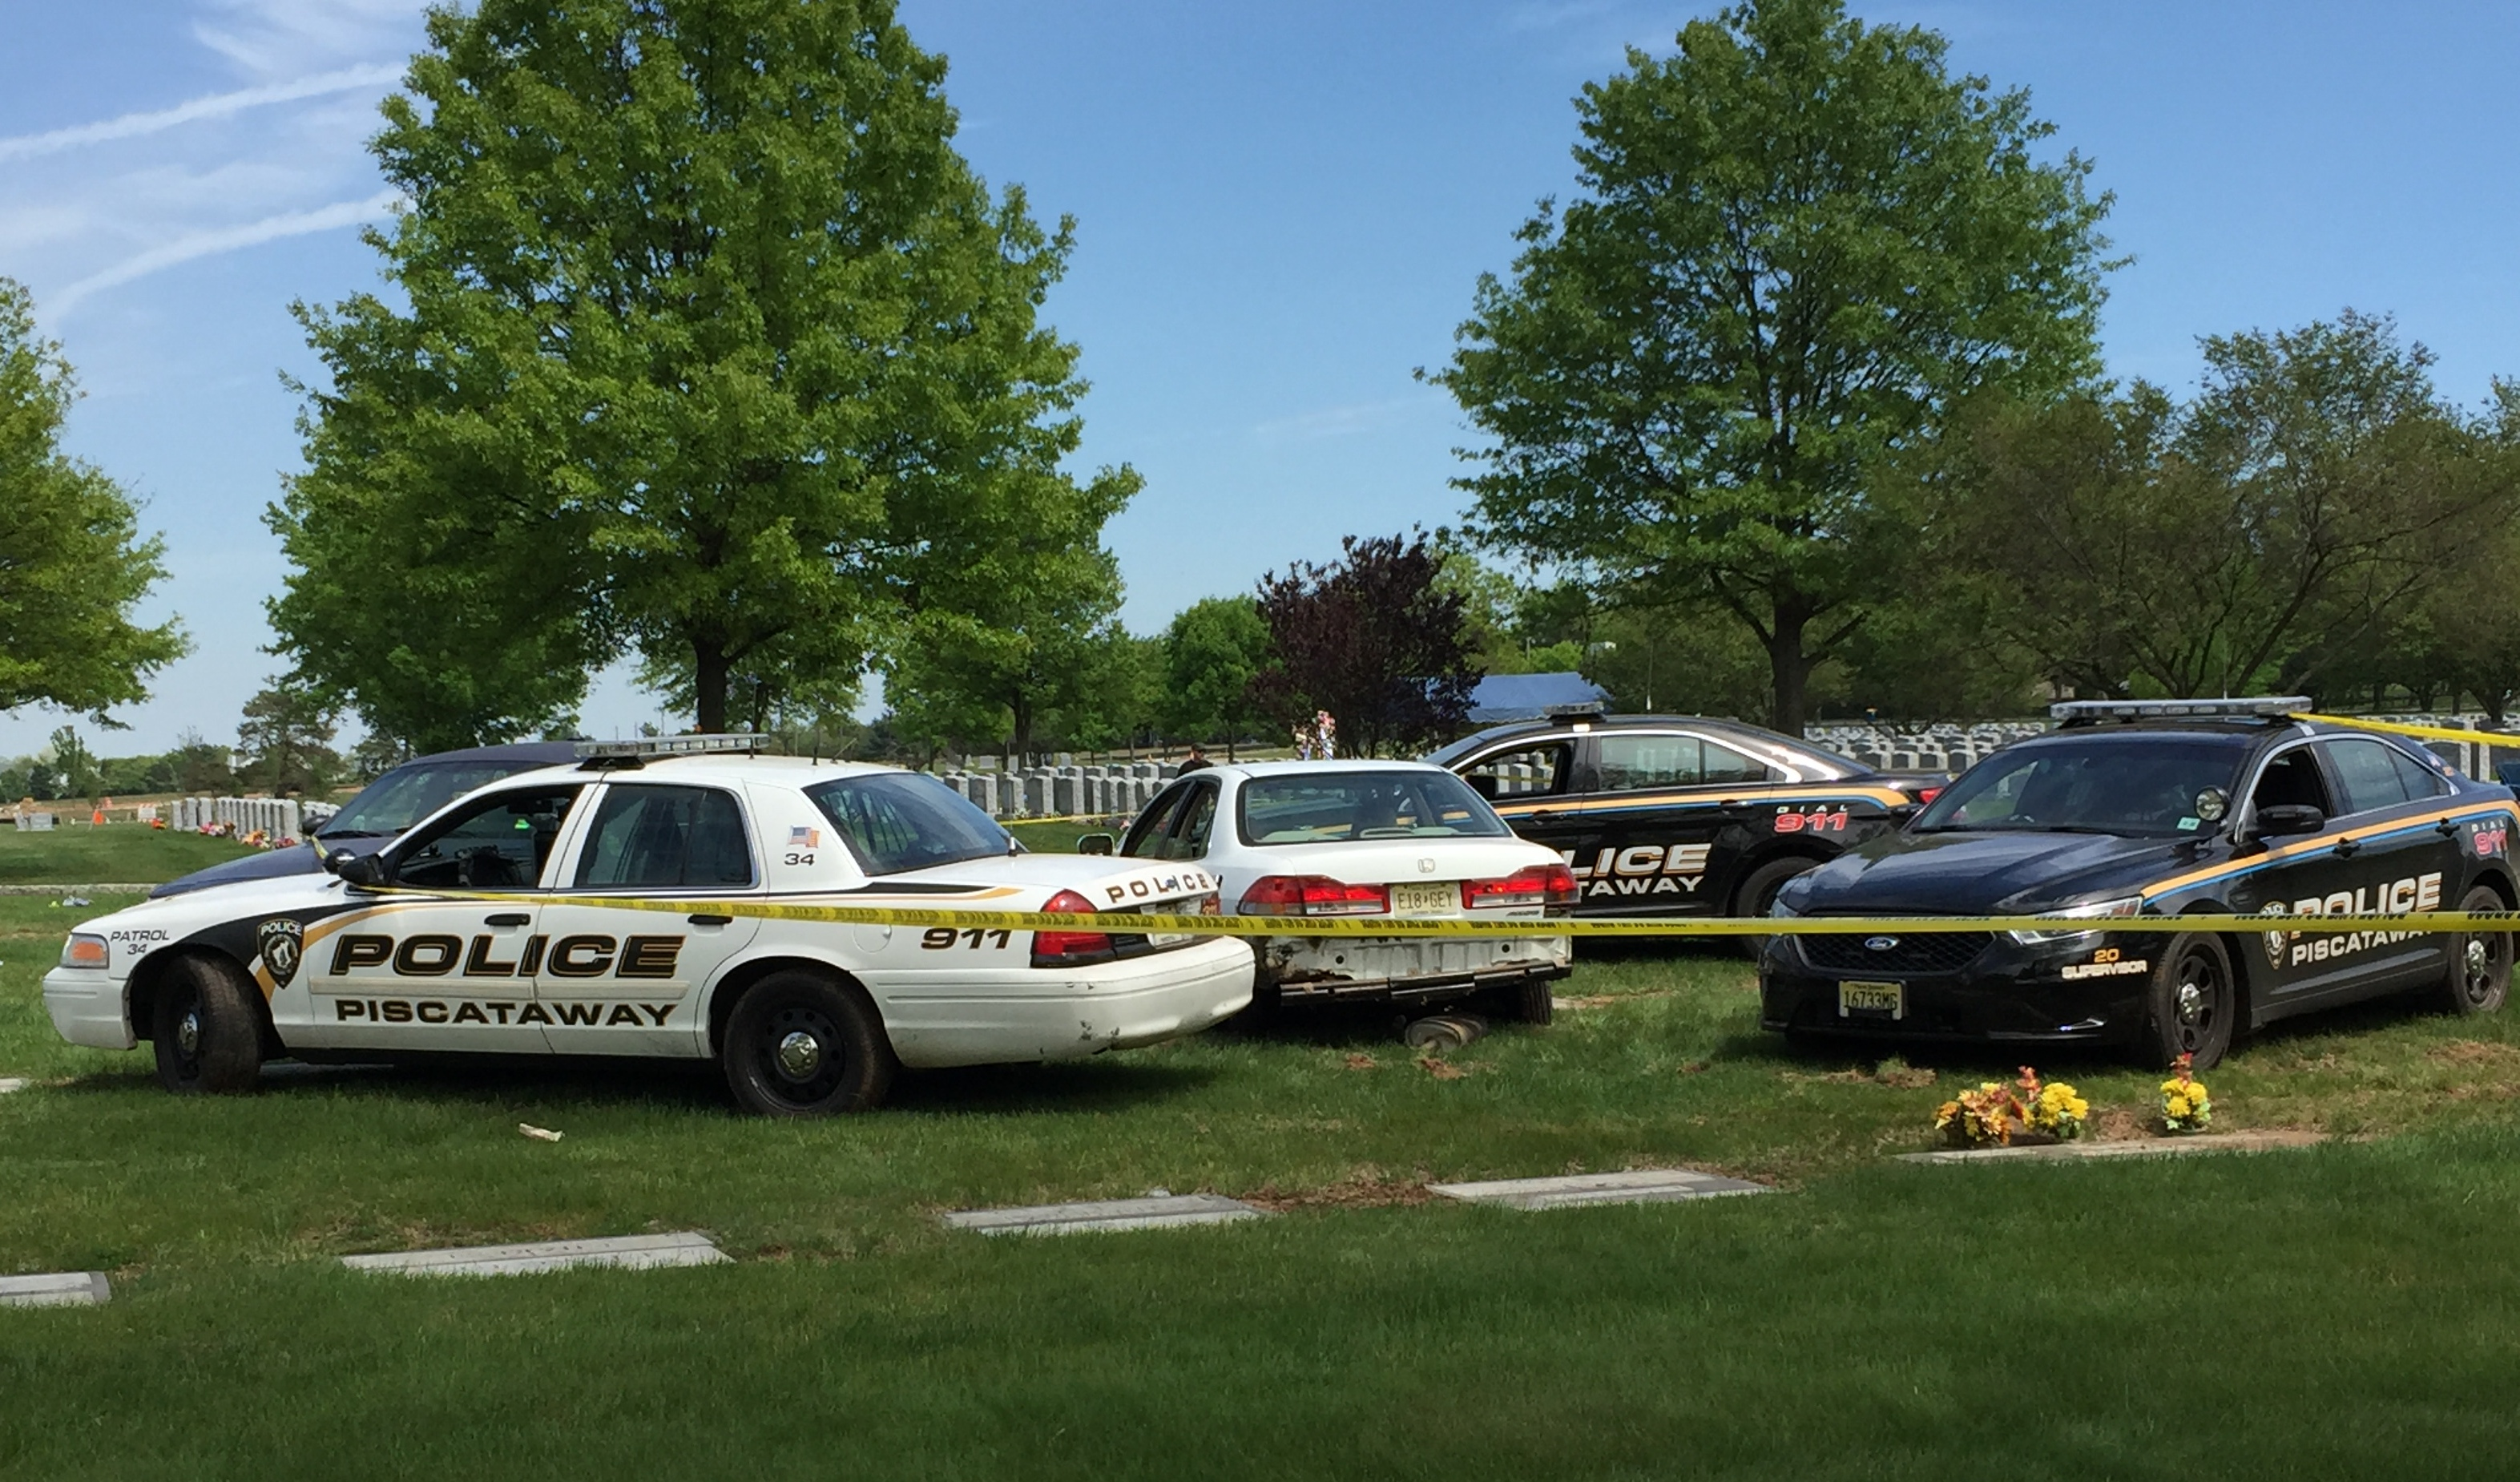 82a8c67de82c19af3205_Cemetery_Police_Car_Chase_013_crop.jpg